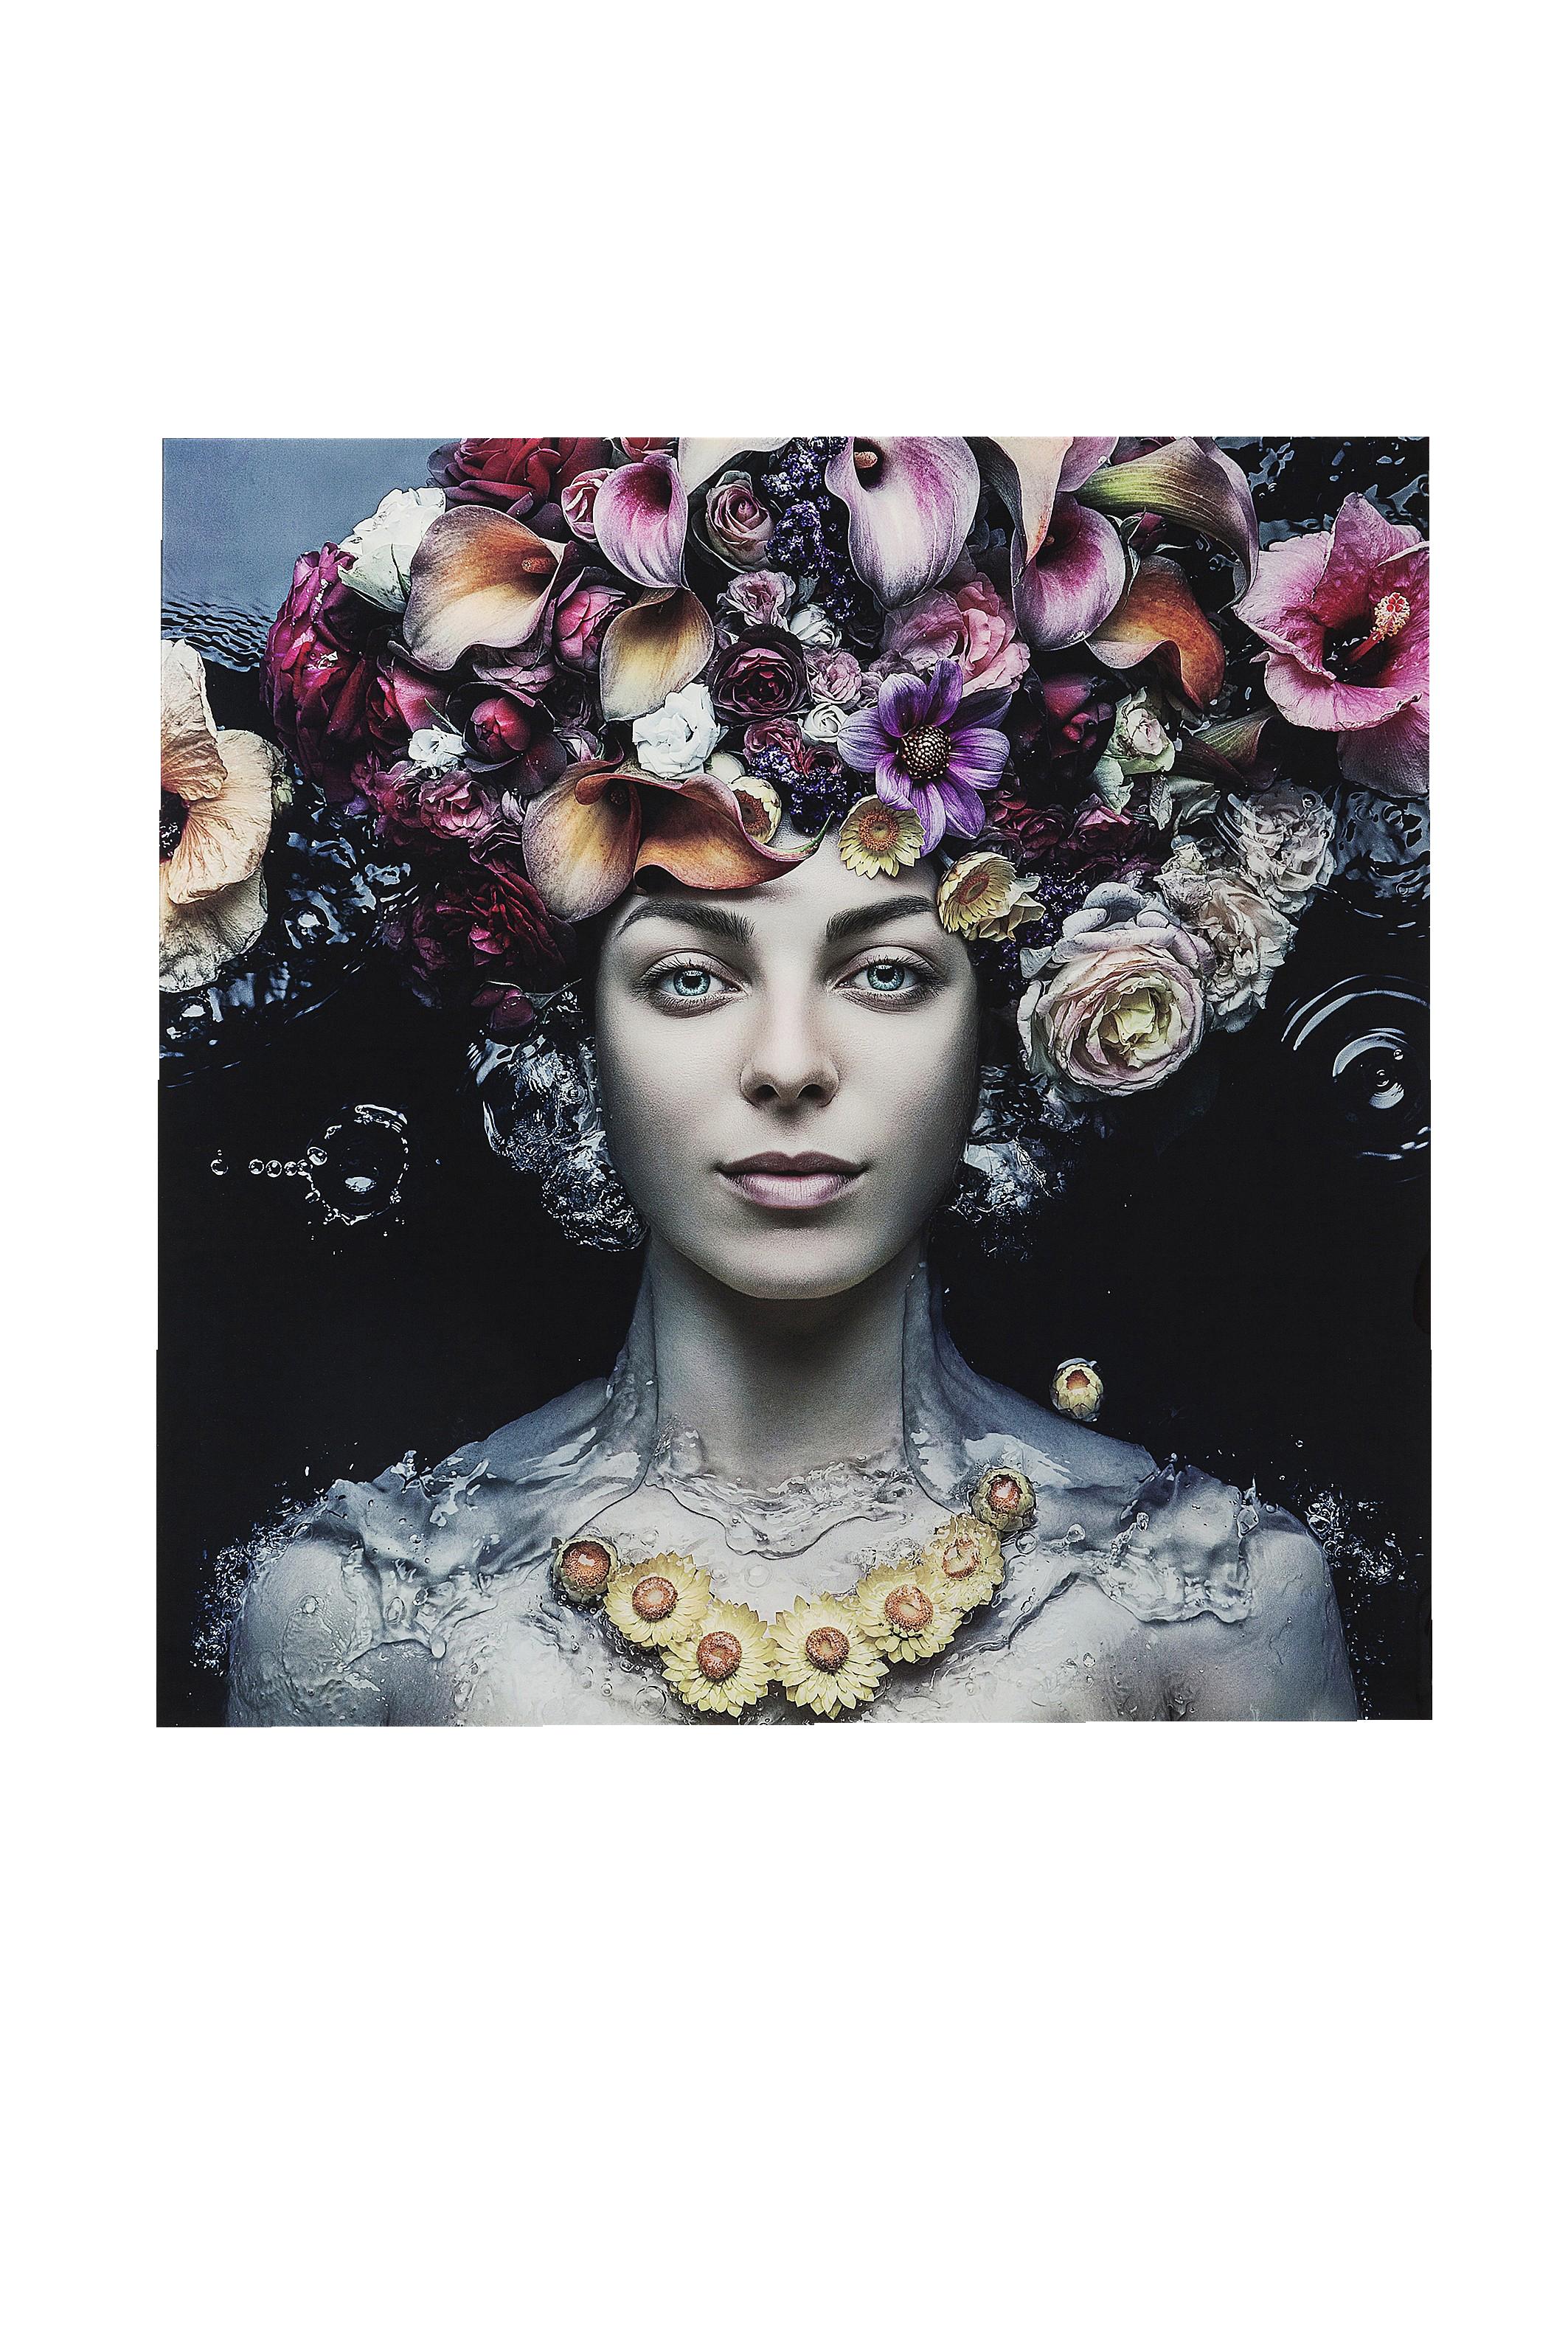 Bild Glas Flower Art Lady 120x120cm